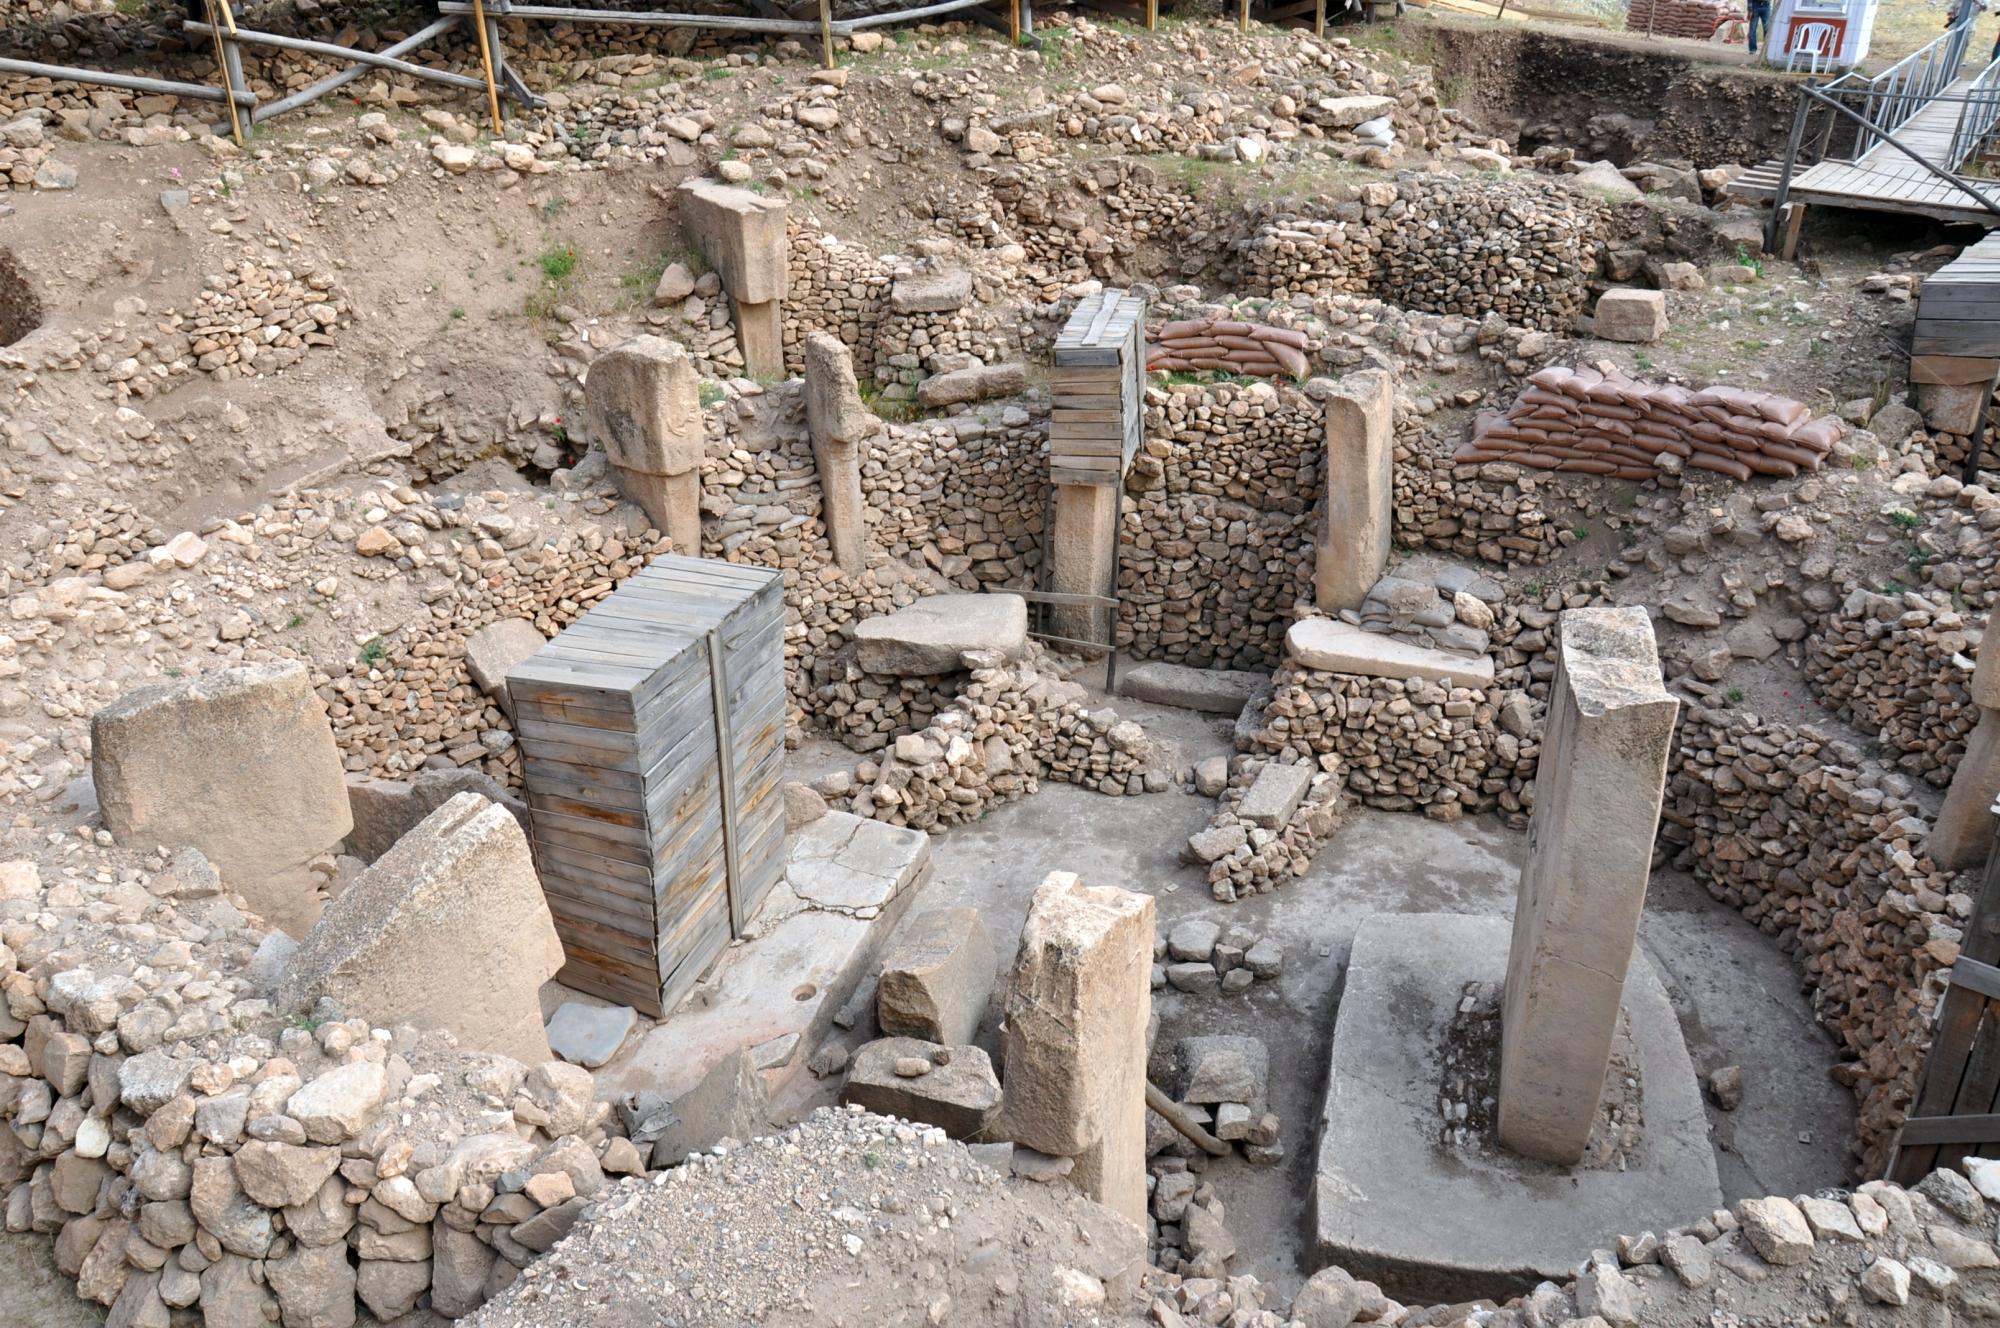 Göbekli Tepe is now UNESCO World Heritage Site